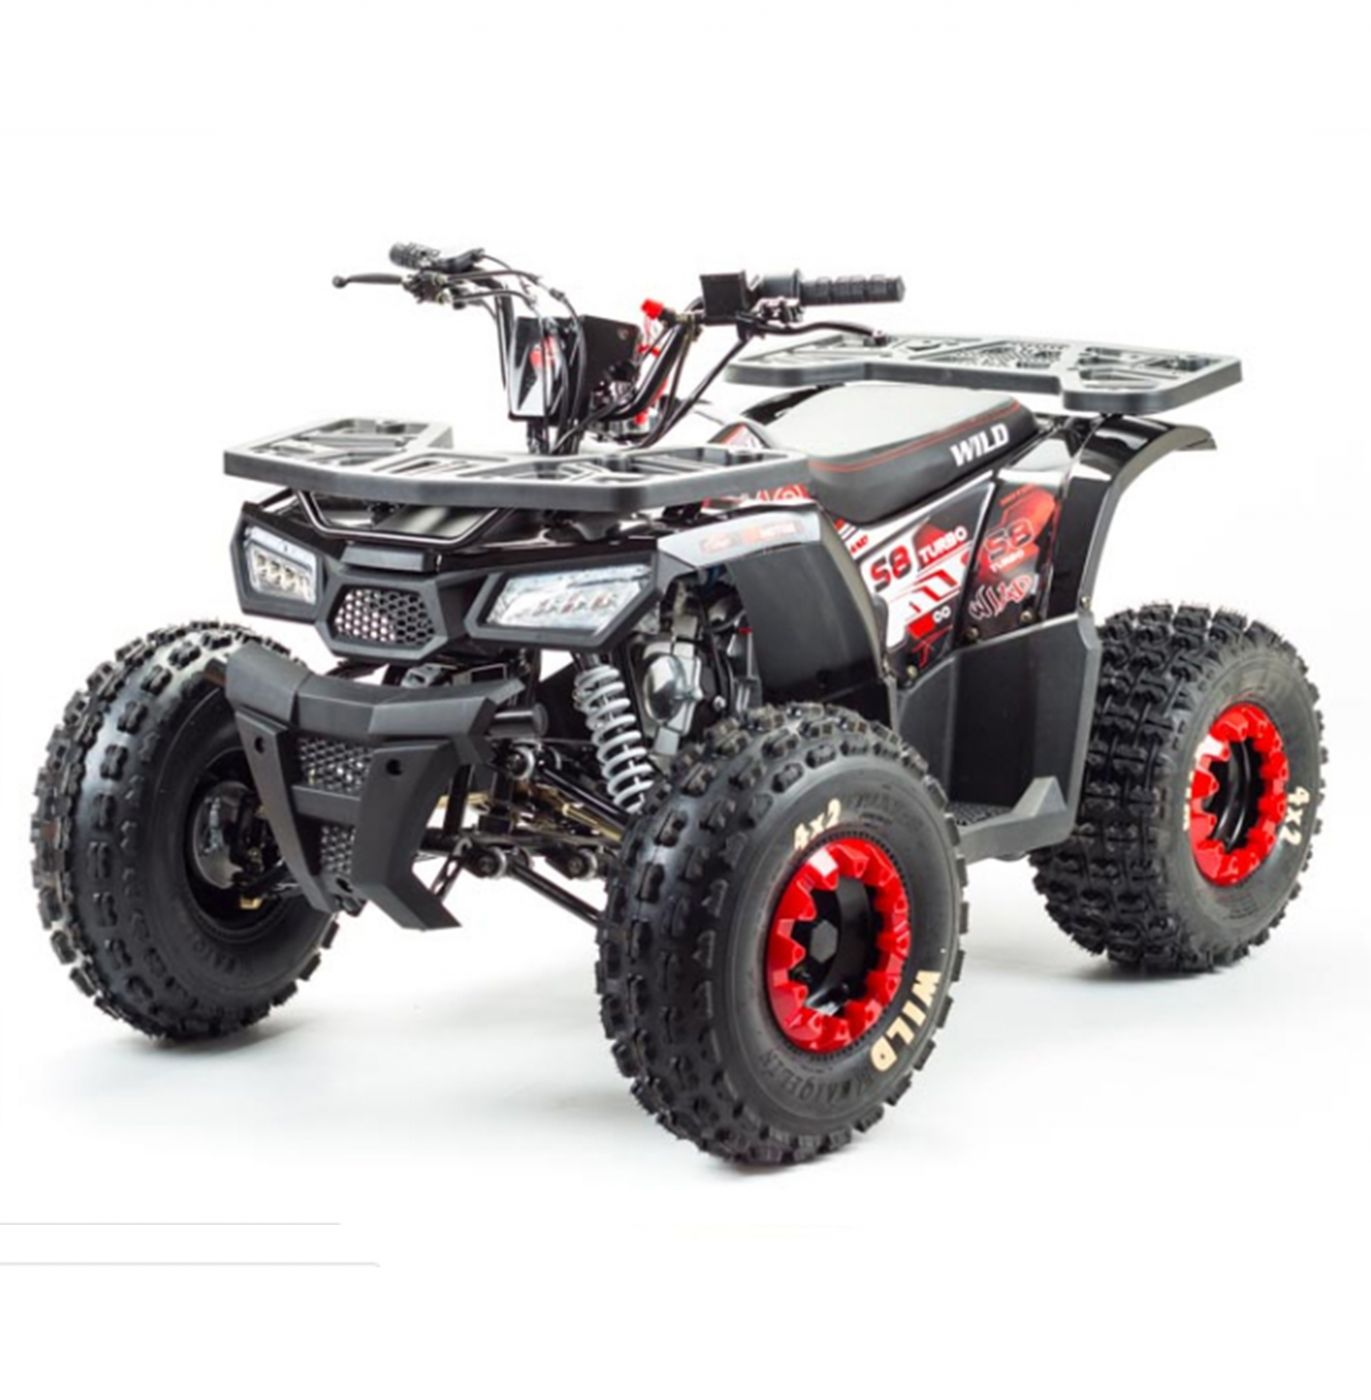 Motoland Wild 150 сс Квадроцикл бензиновый